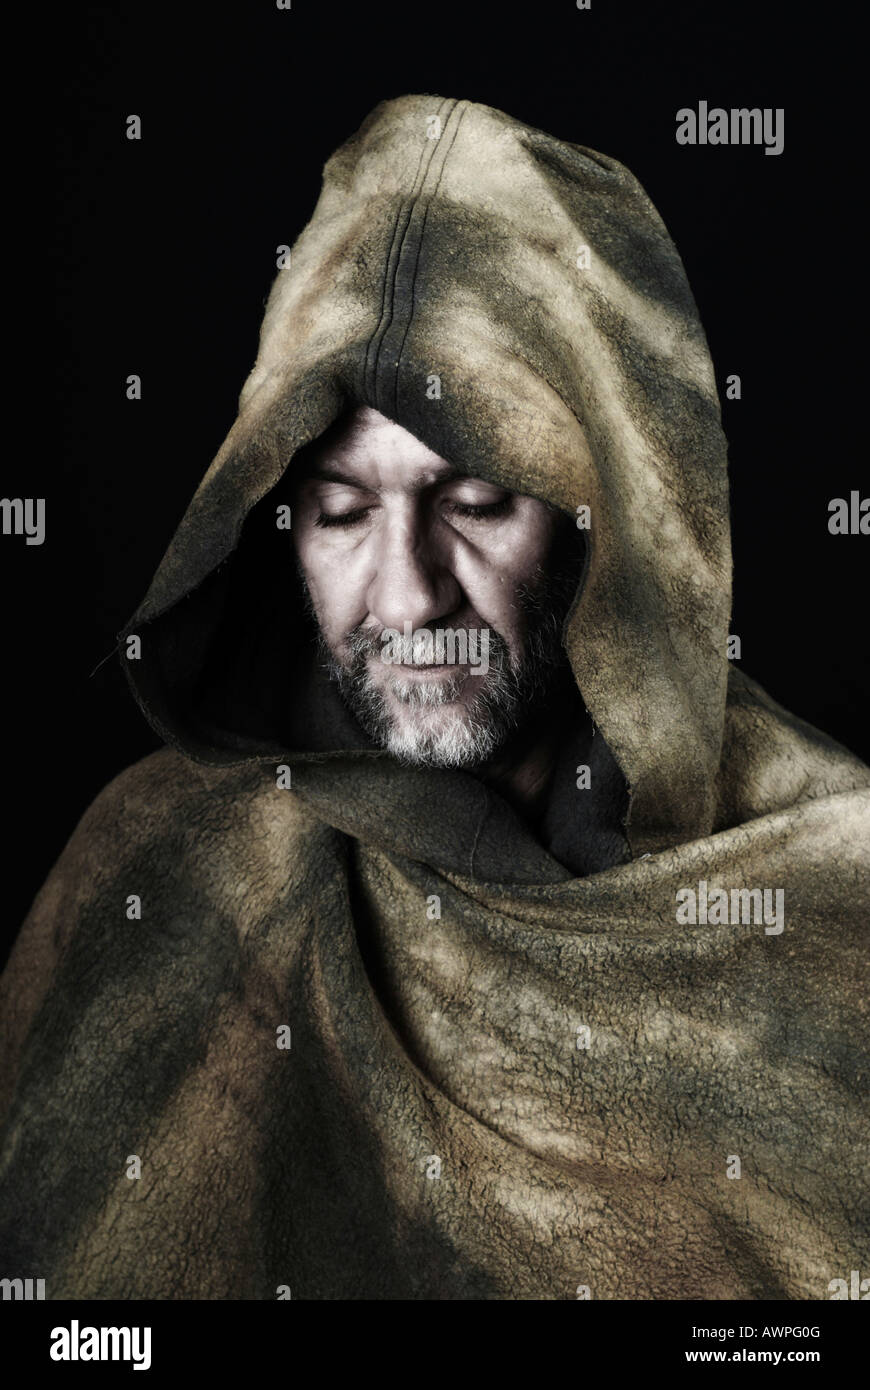 Hooded monk wearing cloak - Stock Image